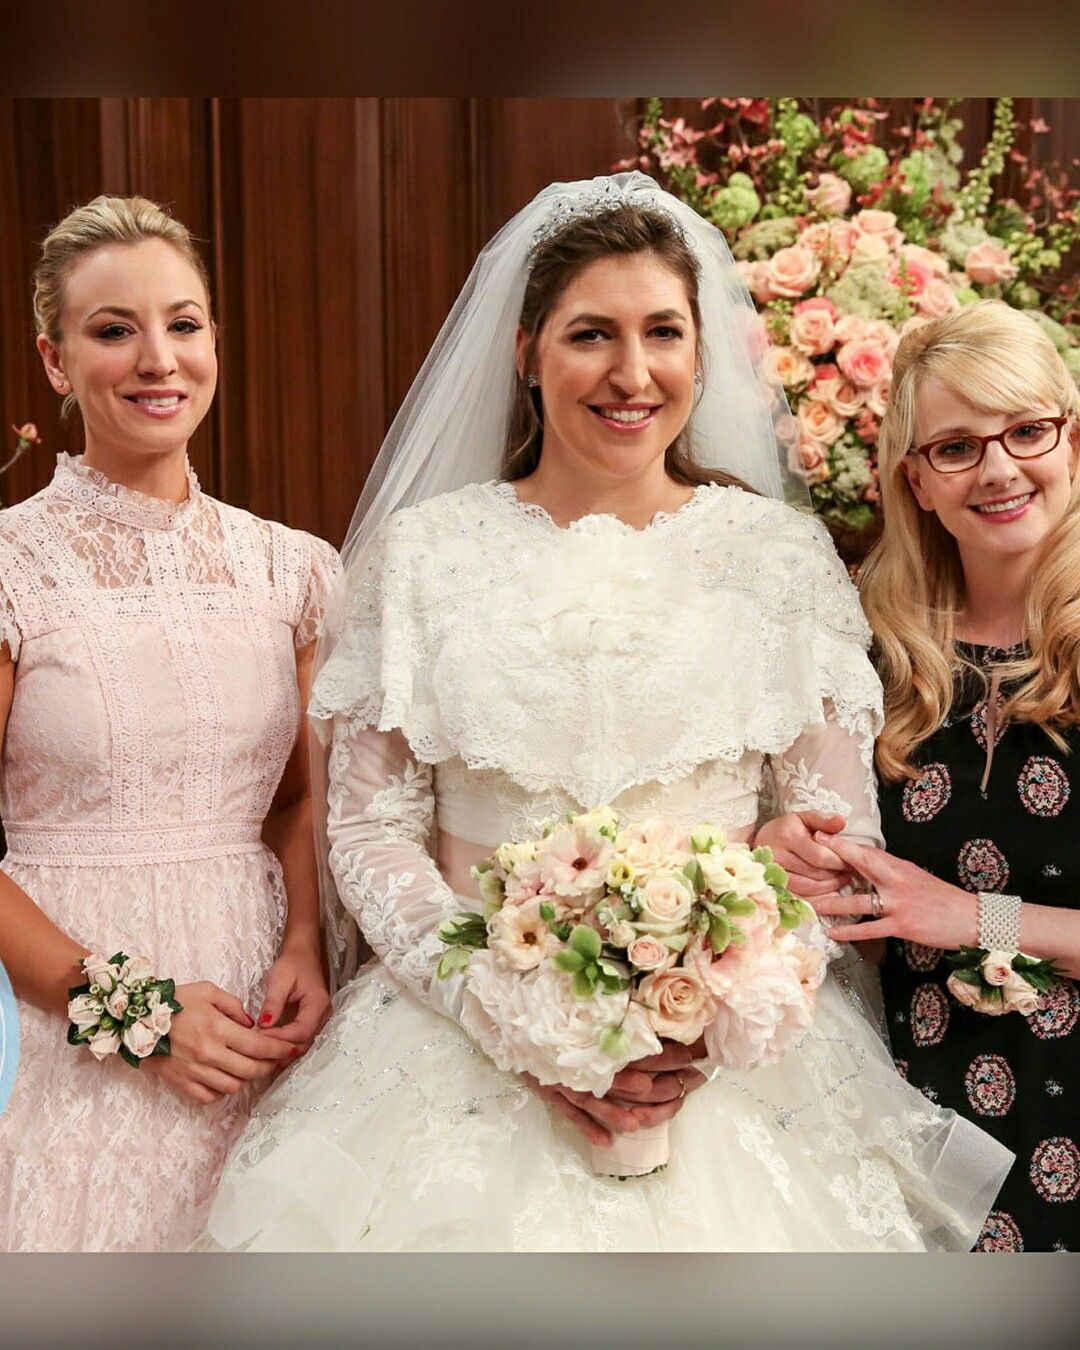 Amy's wedding dress  Penny Amy and Bernadette on Shamyus wedding day TBBT  The Big